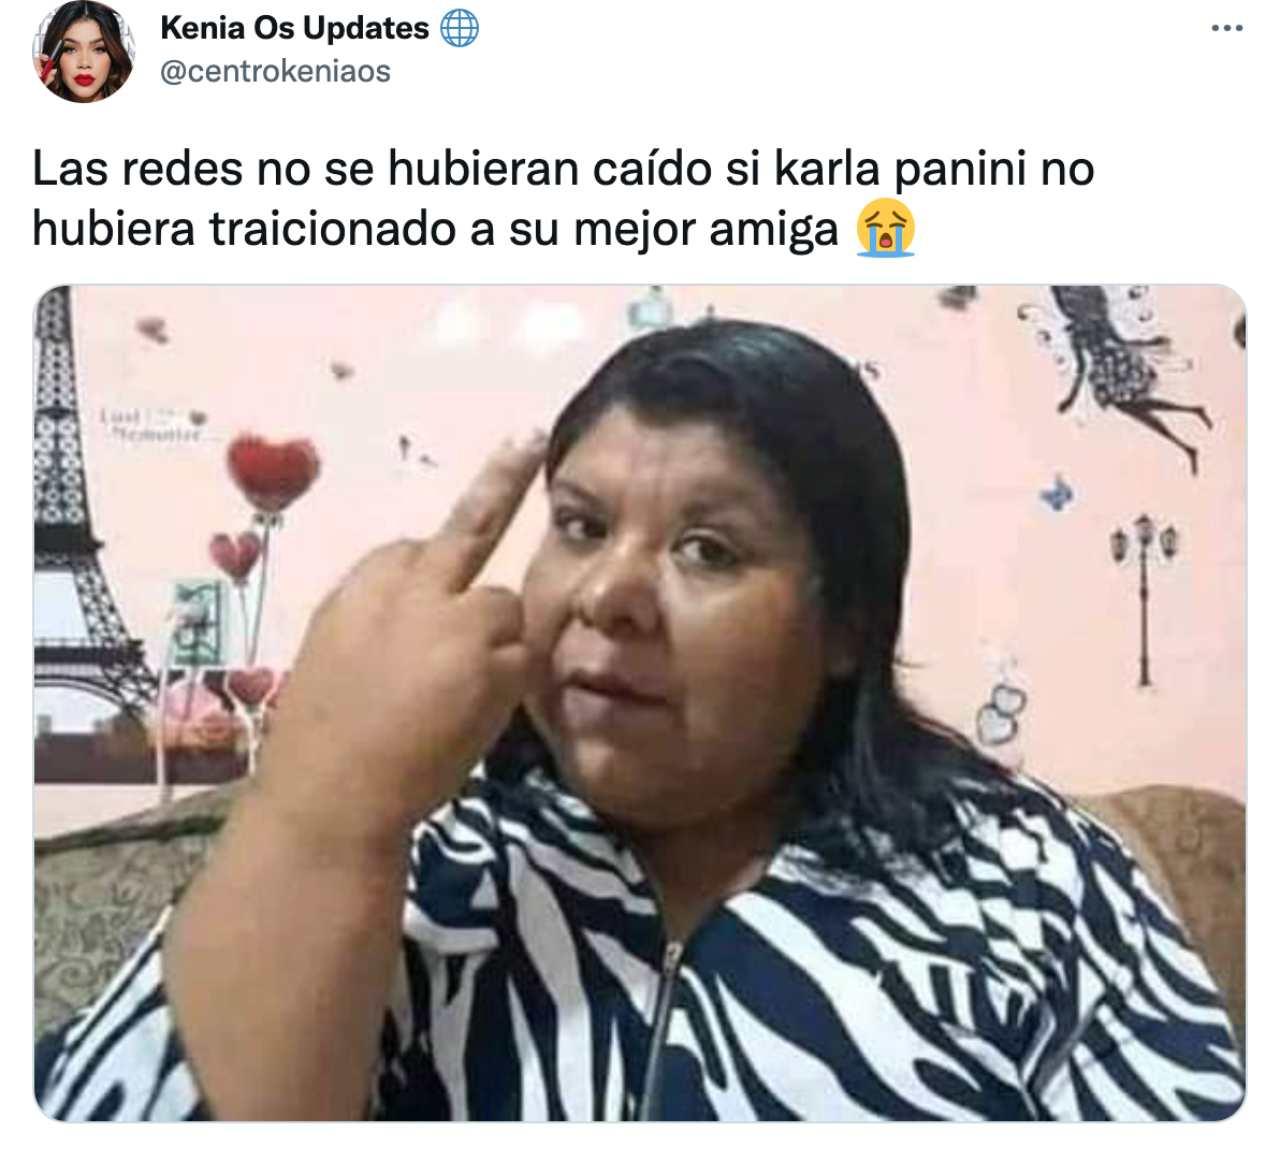 Culpan Karla Panini caida redes sociales